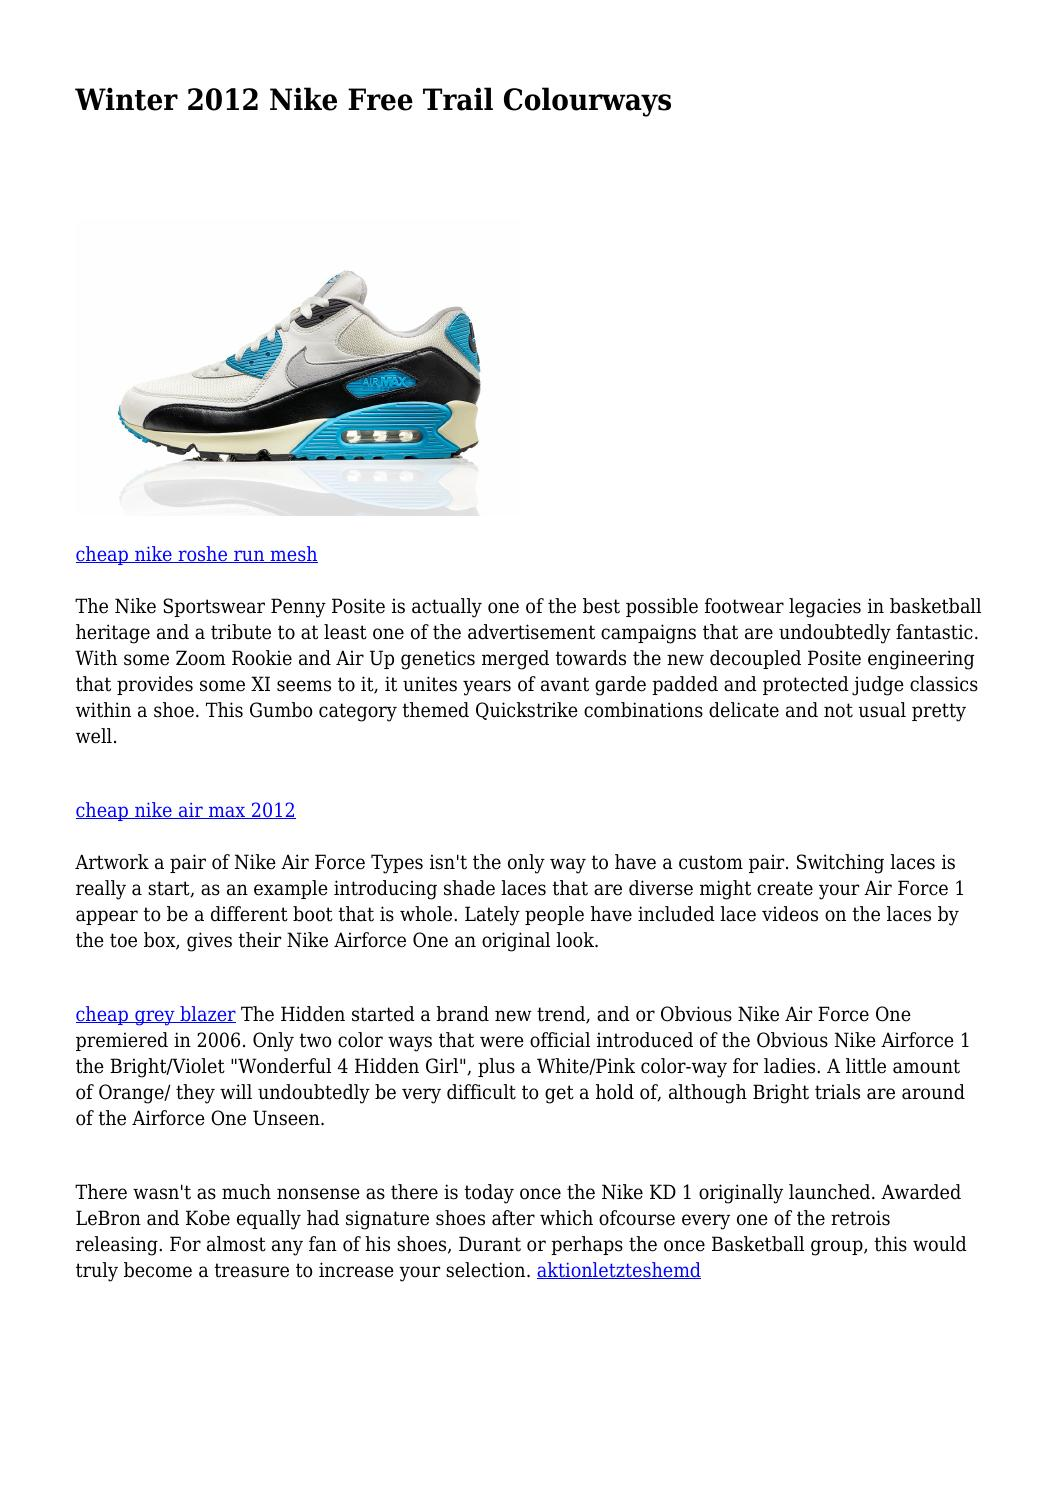 Winter 2012 Nike Free Trail Colourways by makeshiftspray572